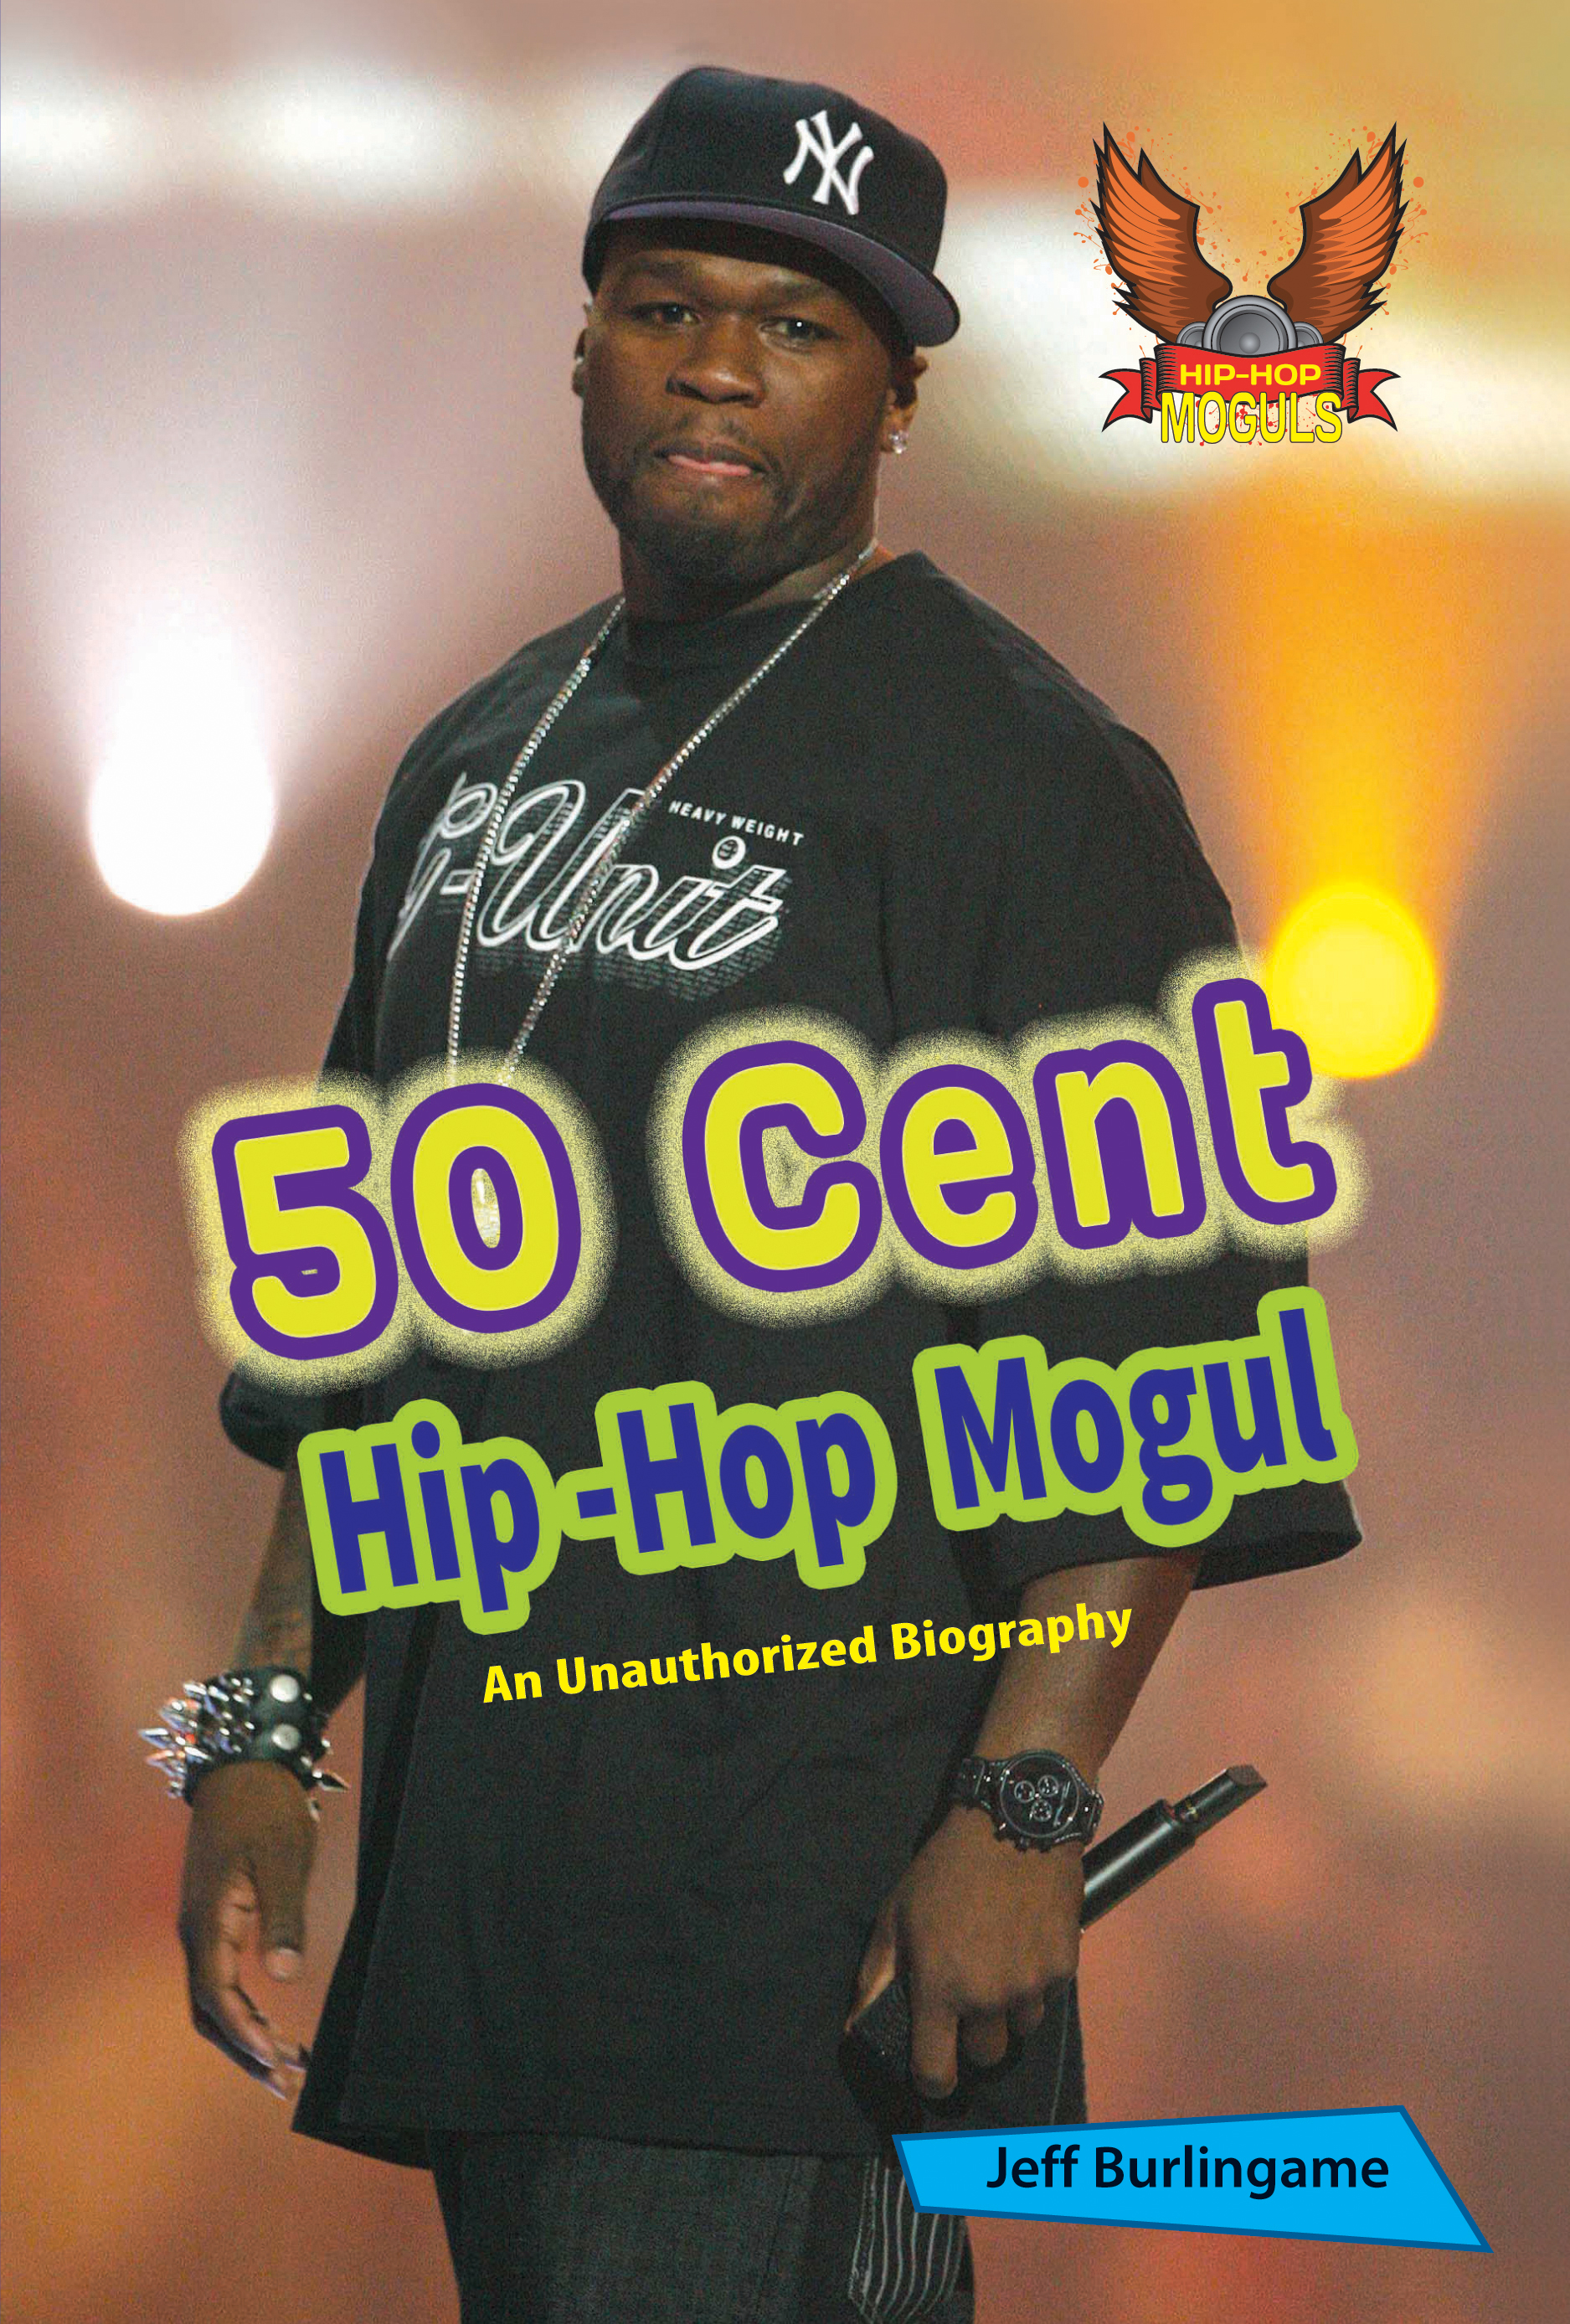 50 Cent Hip-Hop Mogul